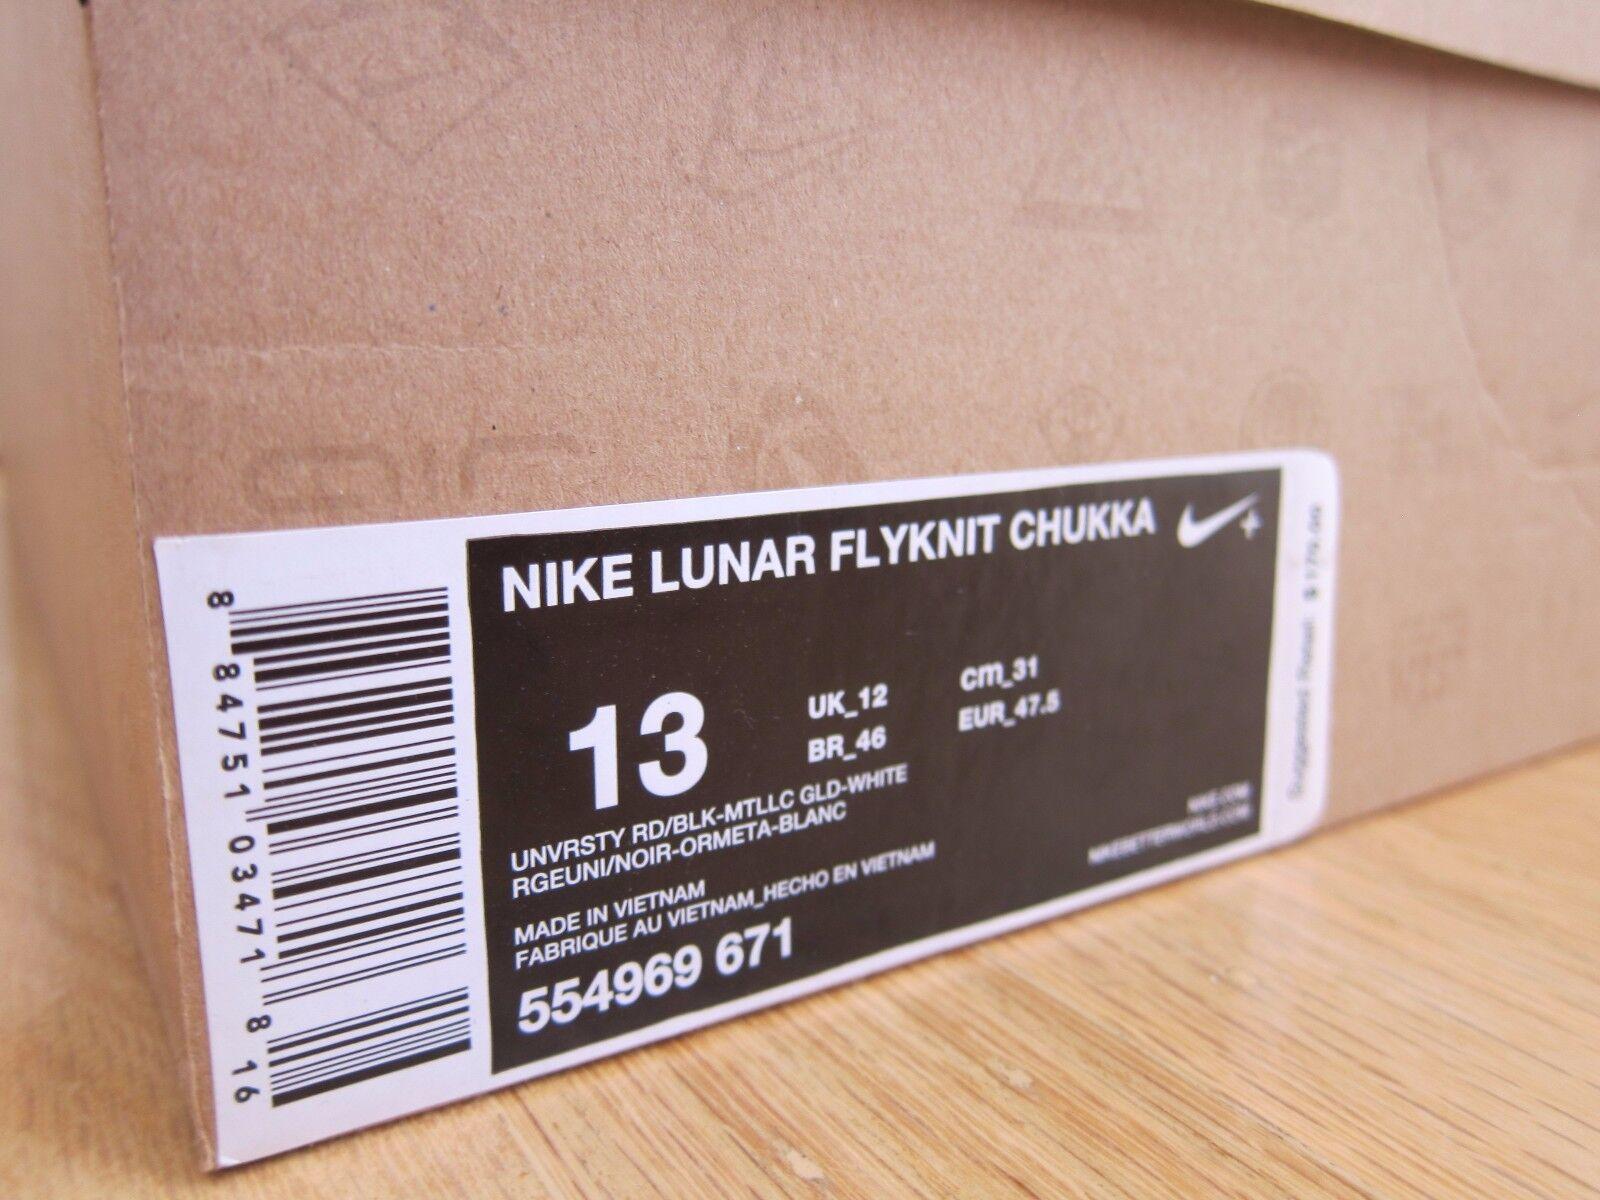 2012 chukka, nike lunar flyknit - chukka, 2012 universität rot - weiße gold schwarze größe. f86653